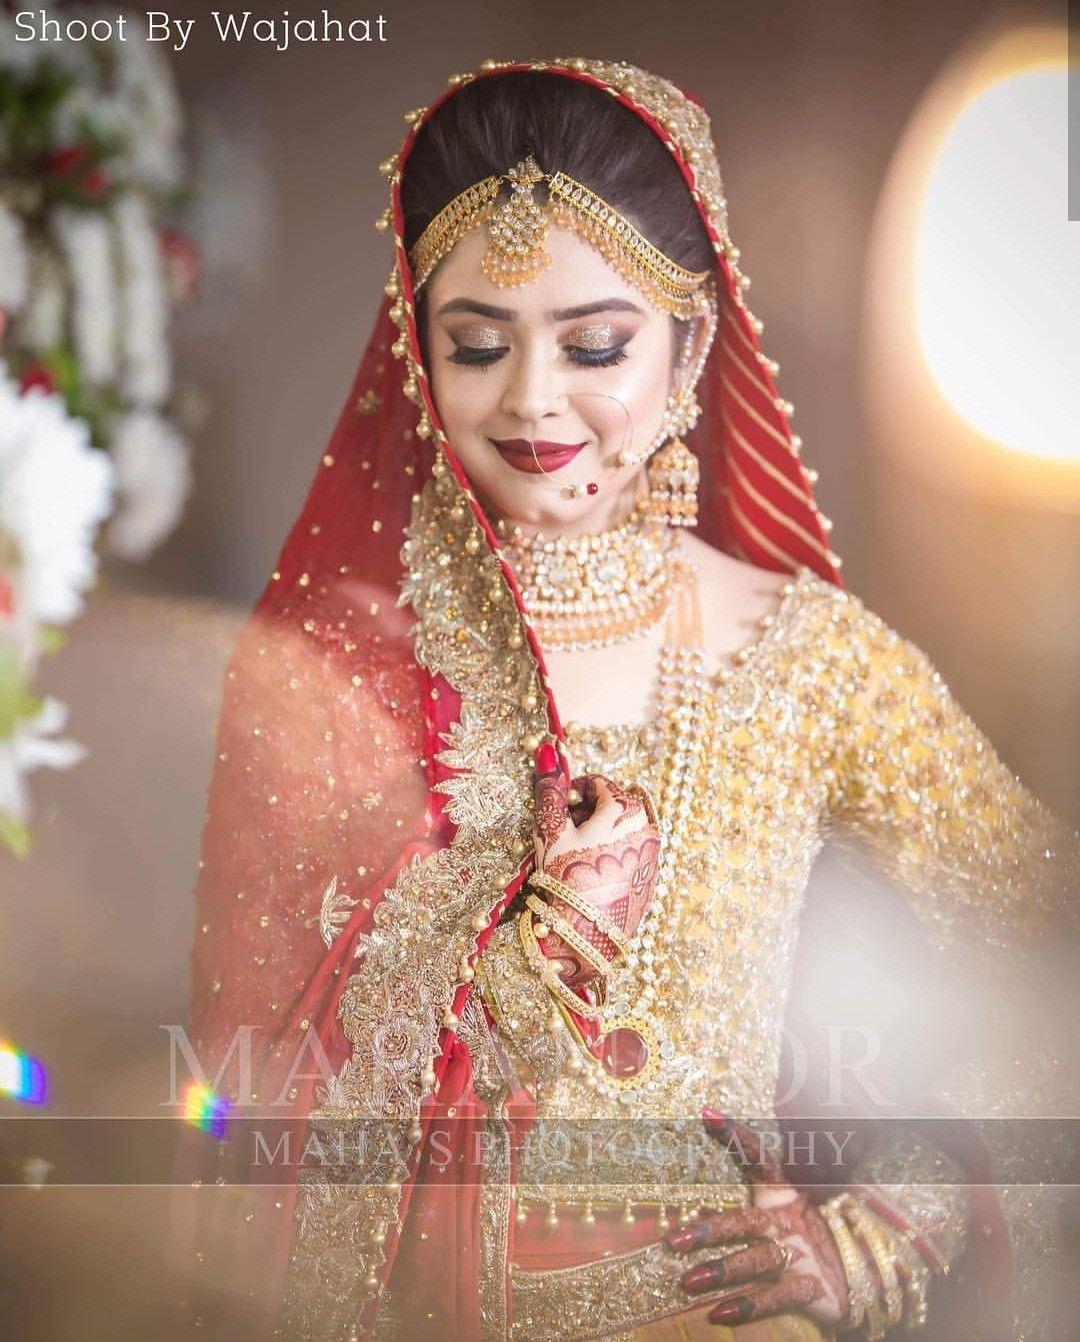 sarah razi on her barat | maha's photography in 2019